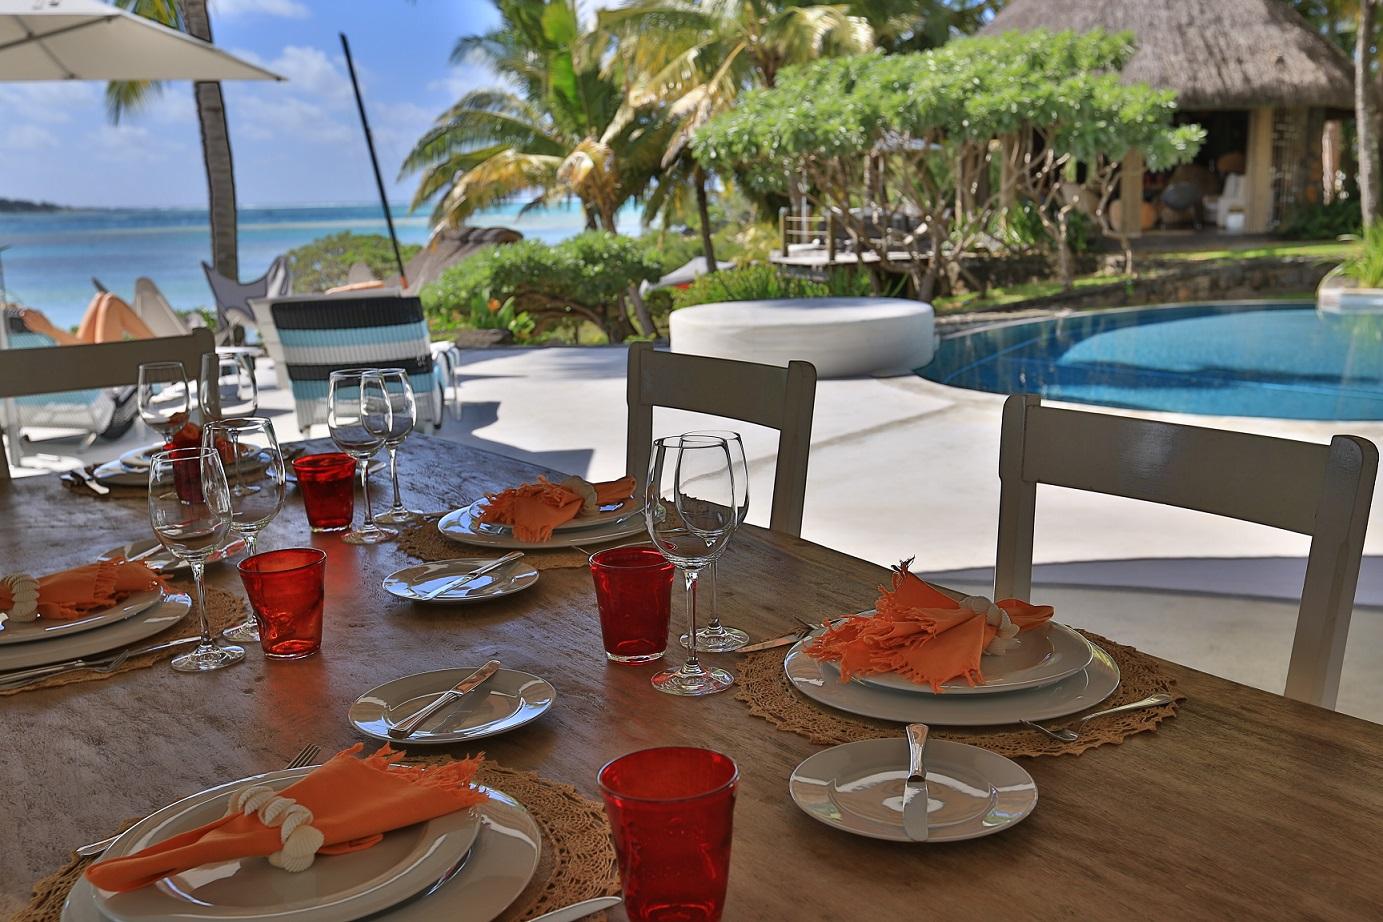 villa-de-luxe-ile-maurice-location-villa-ile-maurice-villa-rental-mauritius-villa-sable-et-mer-piscine-pool-table